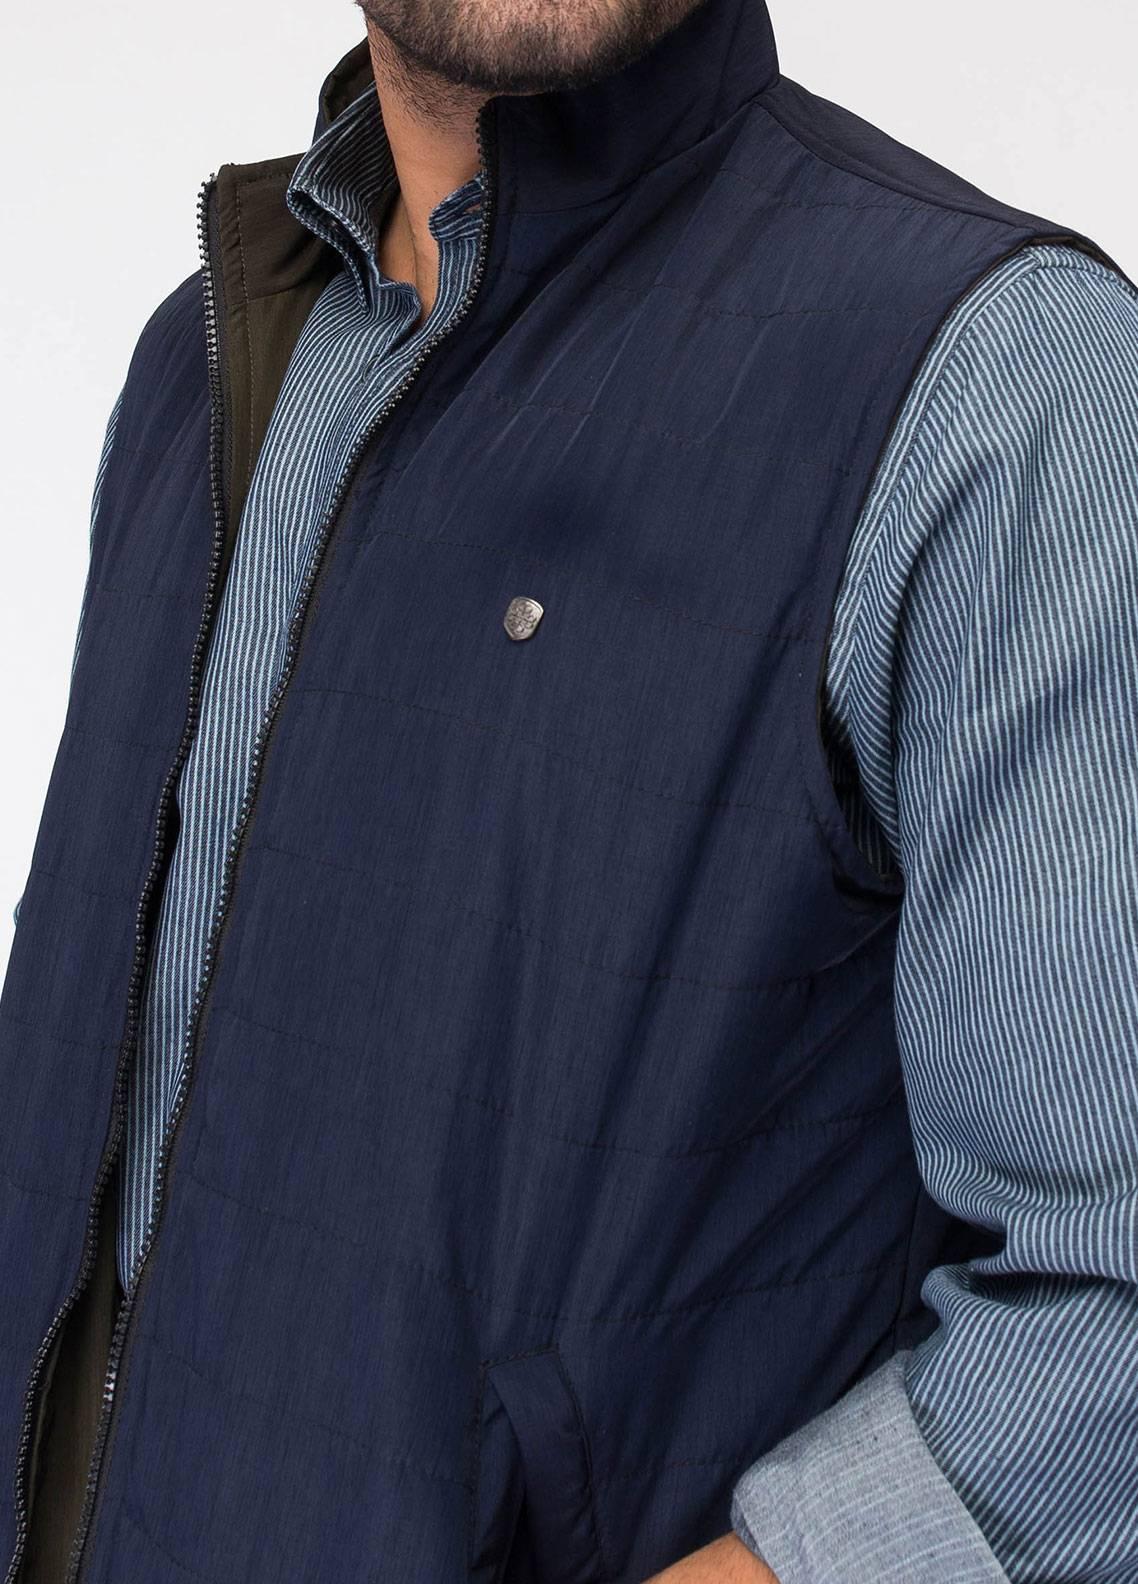 Brumano Polyester Sleeveless Reversible Jackets for Men - Navy Blue BRM-13-1003